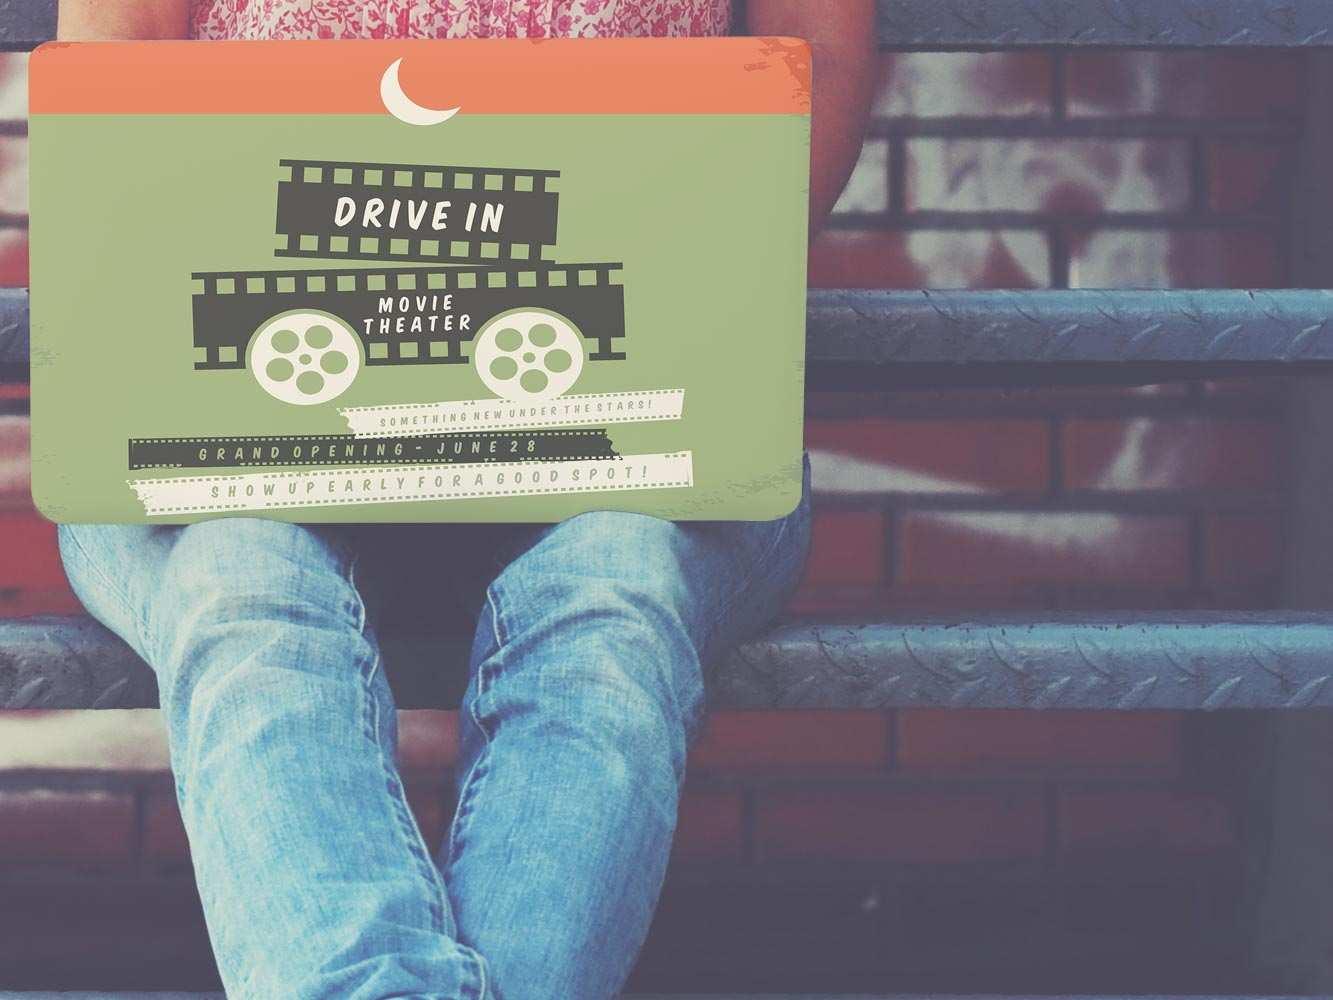 Vinilo Adhesivo PC Portátil Drive In Movie | Carteles XXL - Impresión carteleria publicitaria